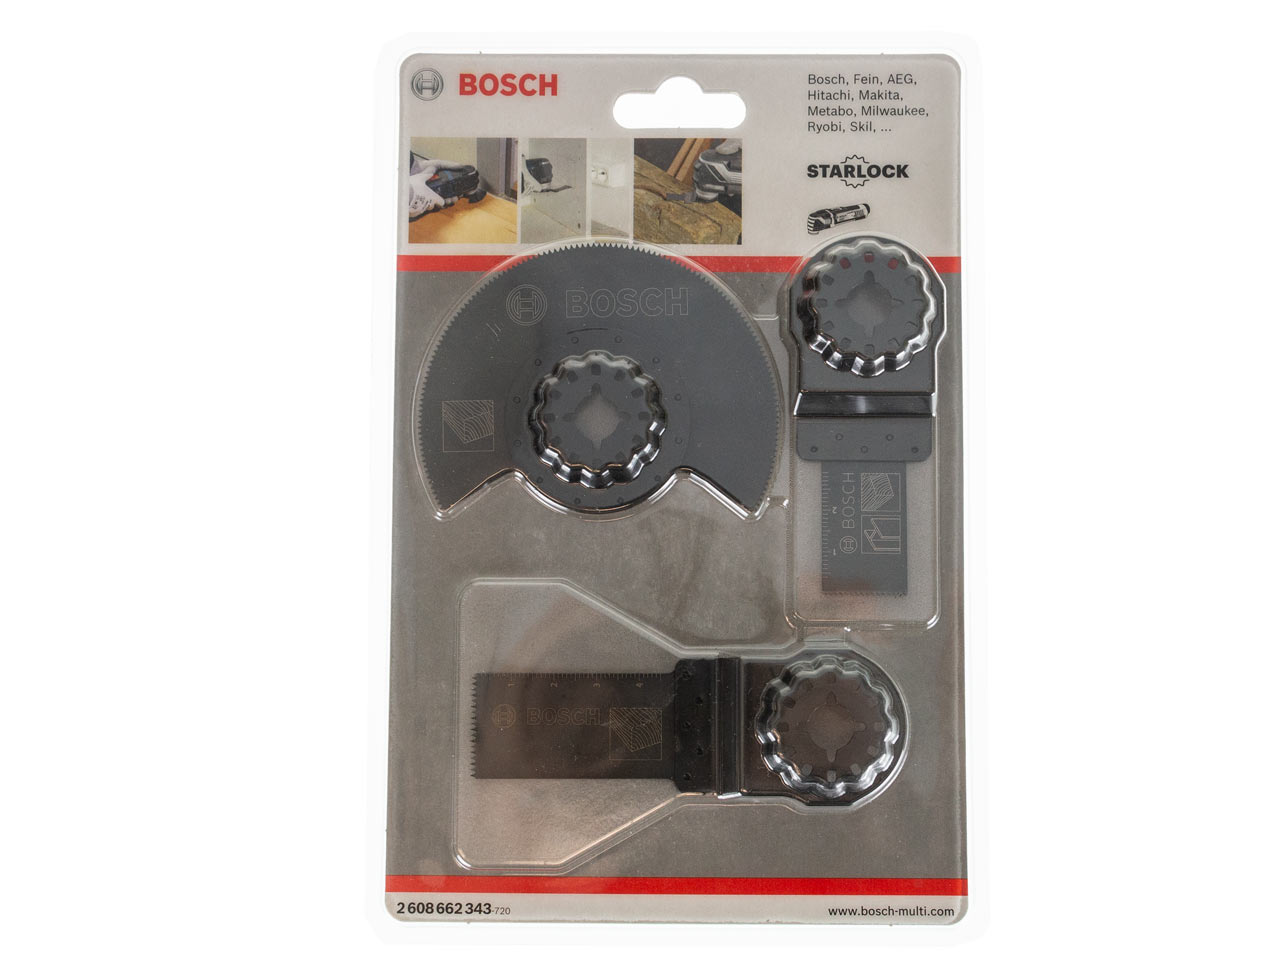 Bosch 2608662343 3pc Starlock Multi-Tool Blade Basic Wood Set